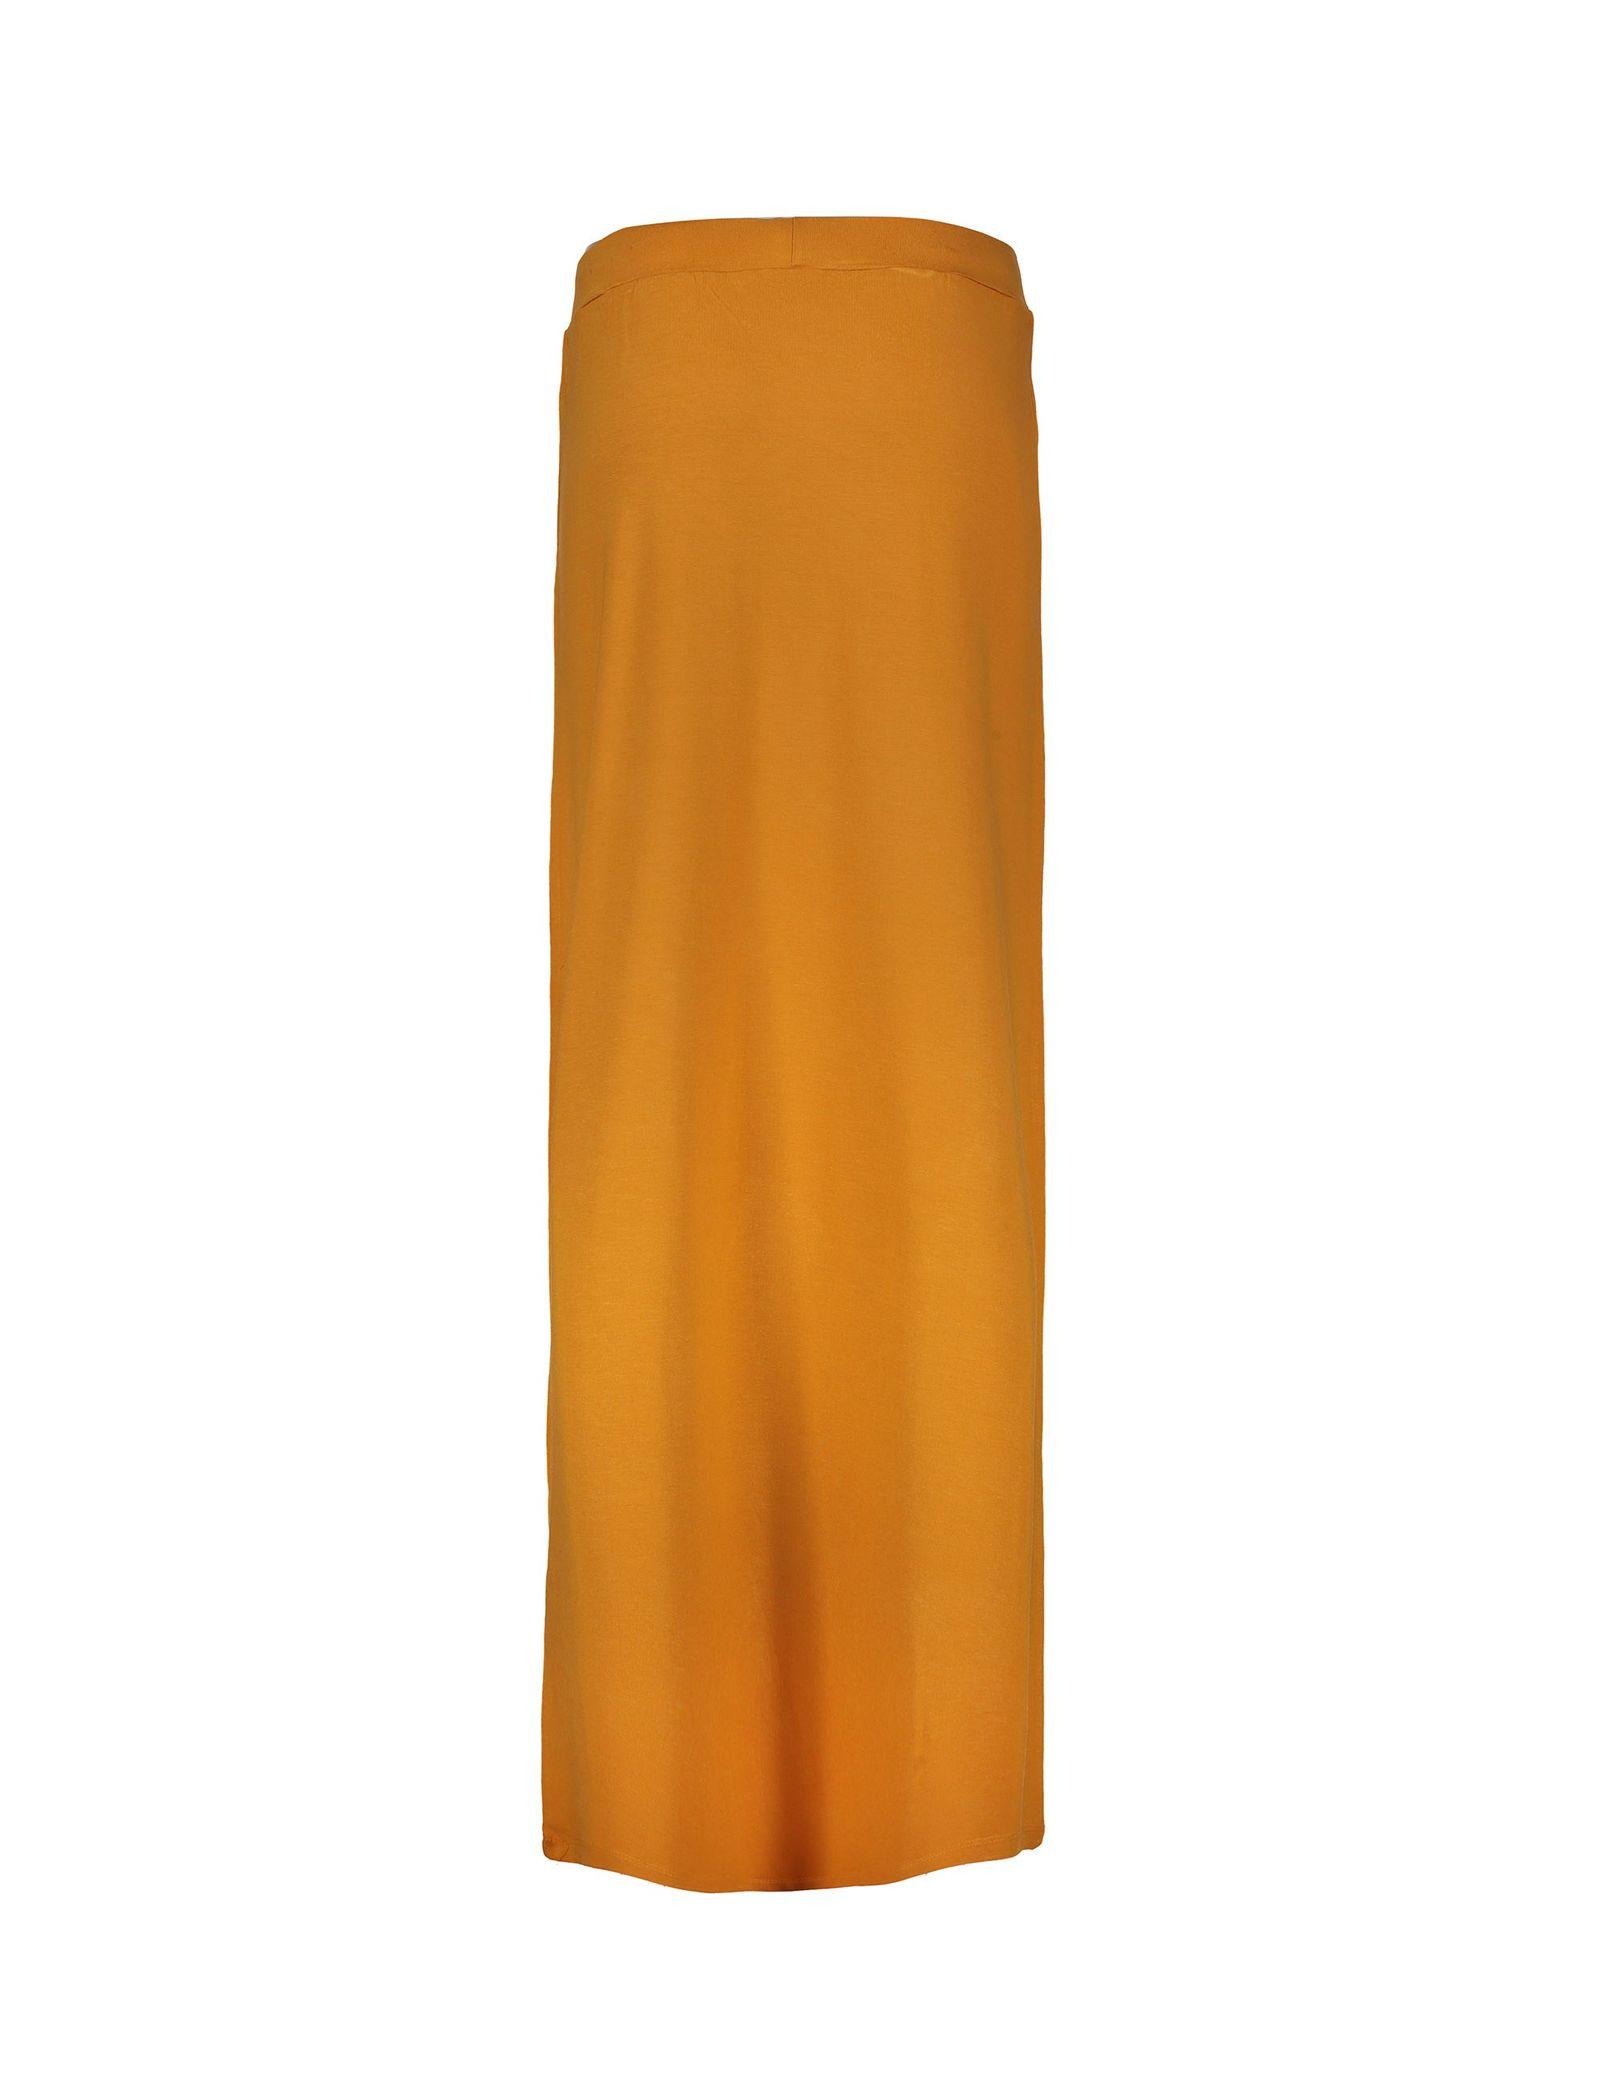 دامن ویسکوز بلند زنانه - جنیفر - خردلي - 2